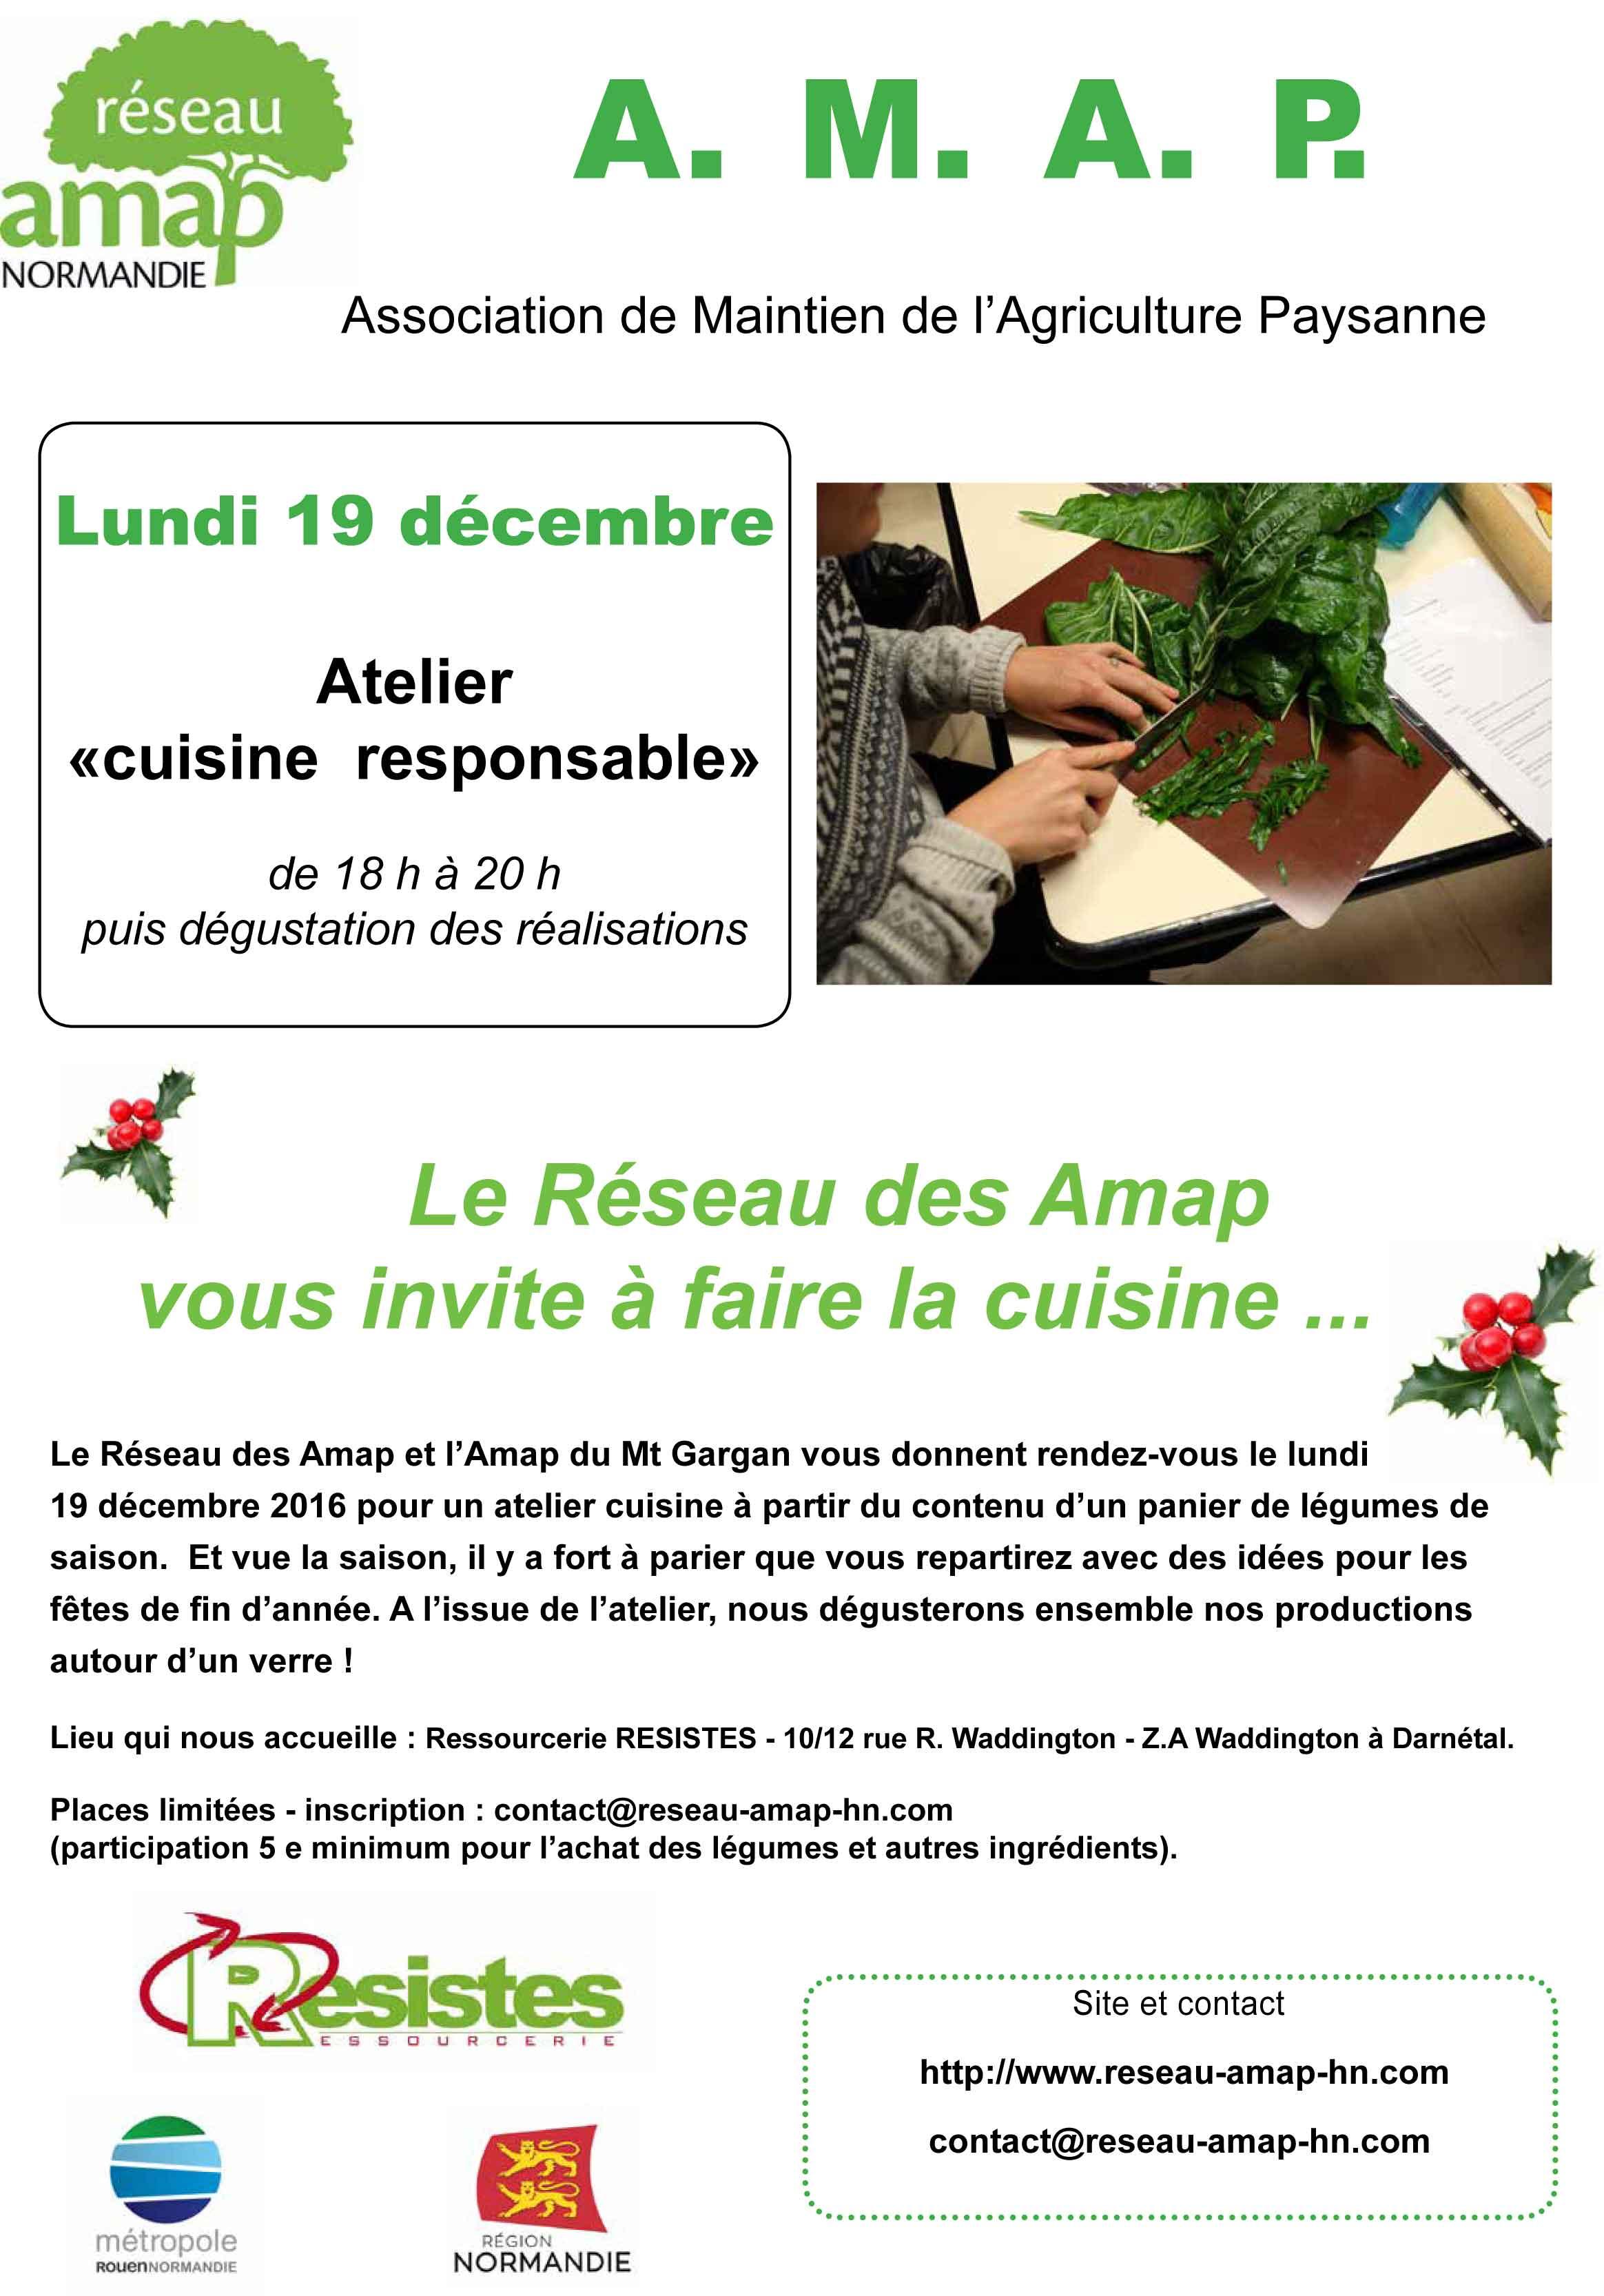 http://reseau-amap-hn.org/content/posts/images/cuisine-gargan.jpg